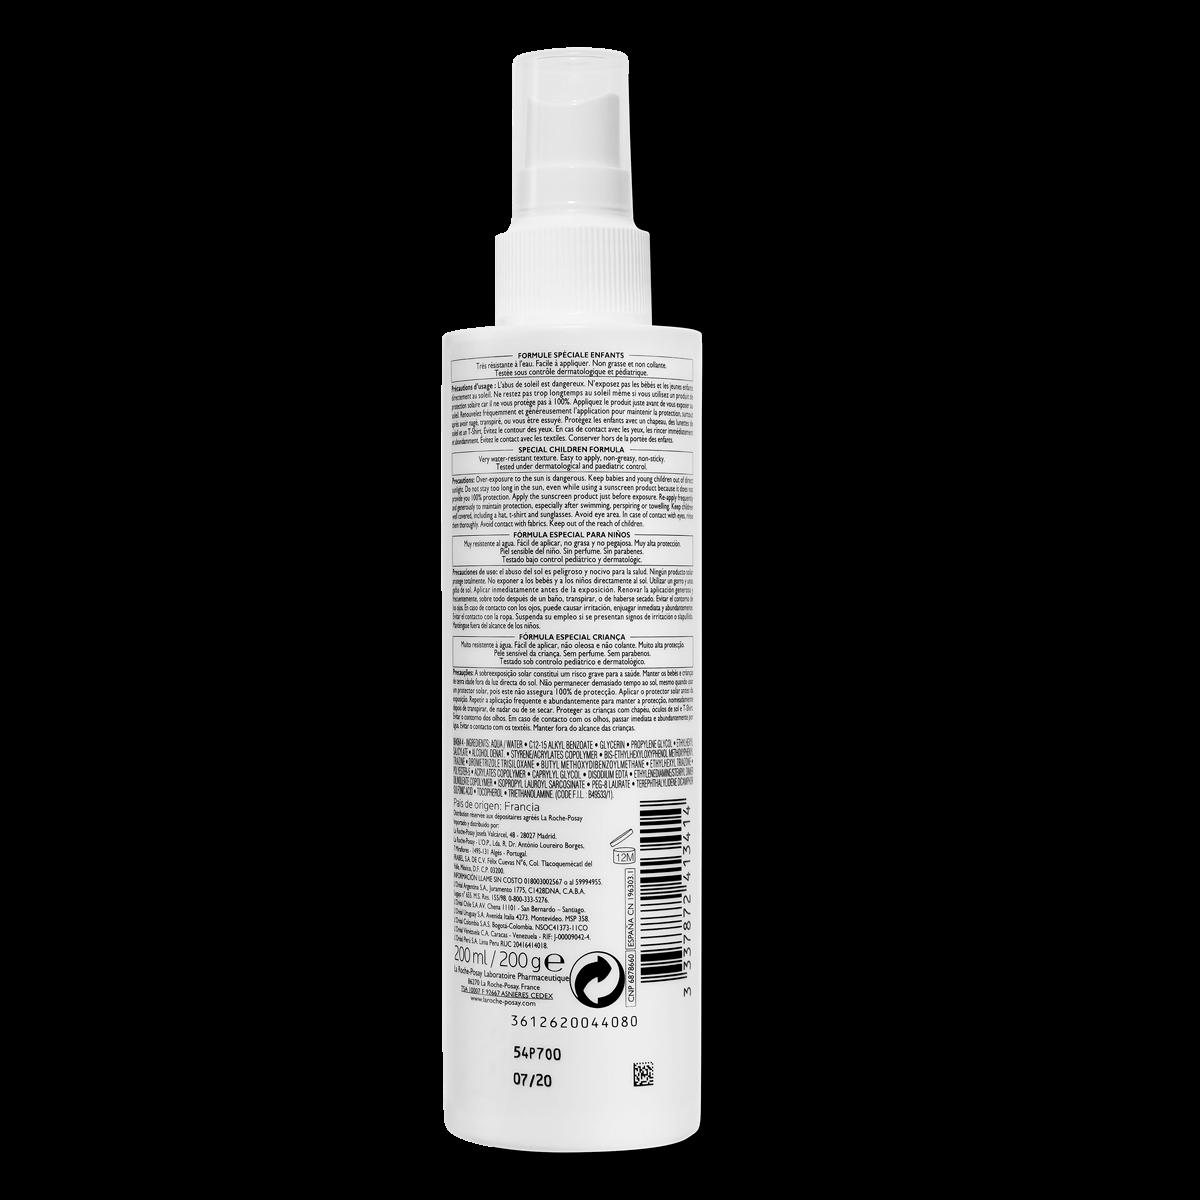 La Roche Posay ProduktSide Sol Anthelios Dermo Pædiatri Spray Spf50